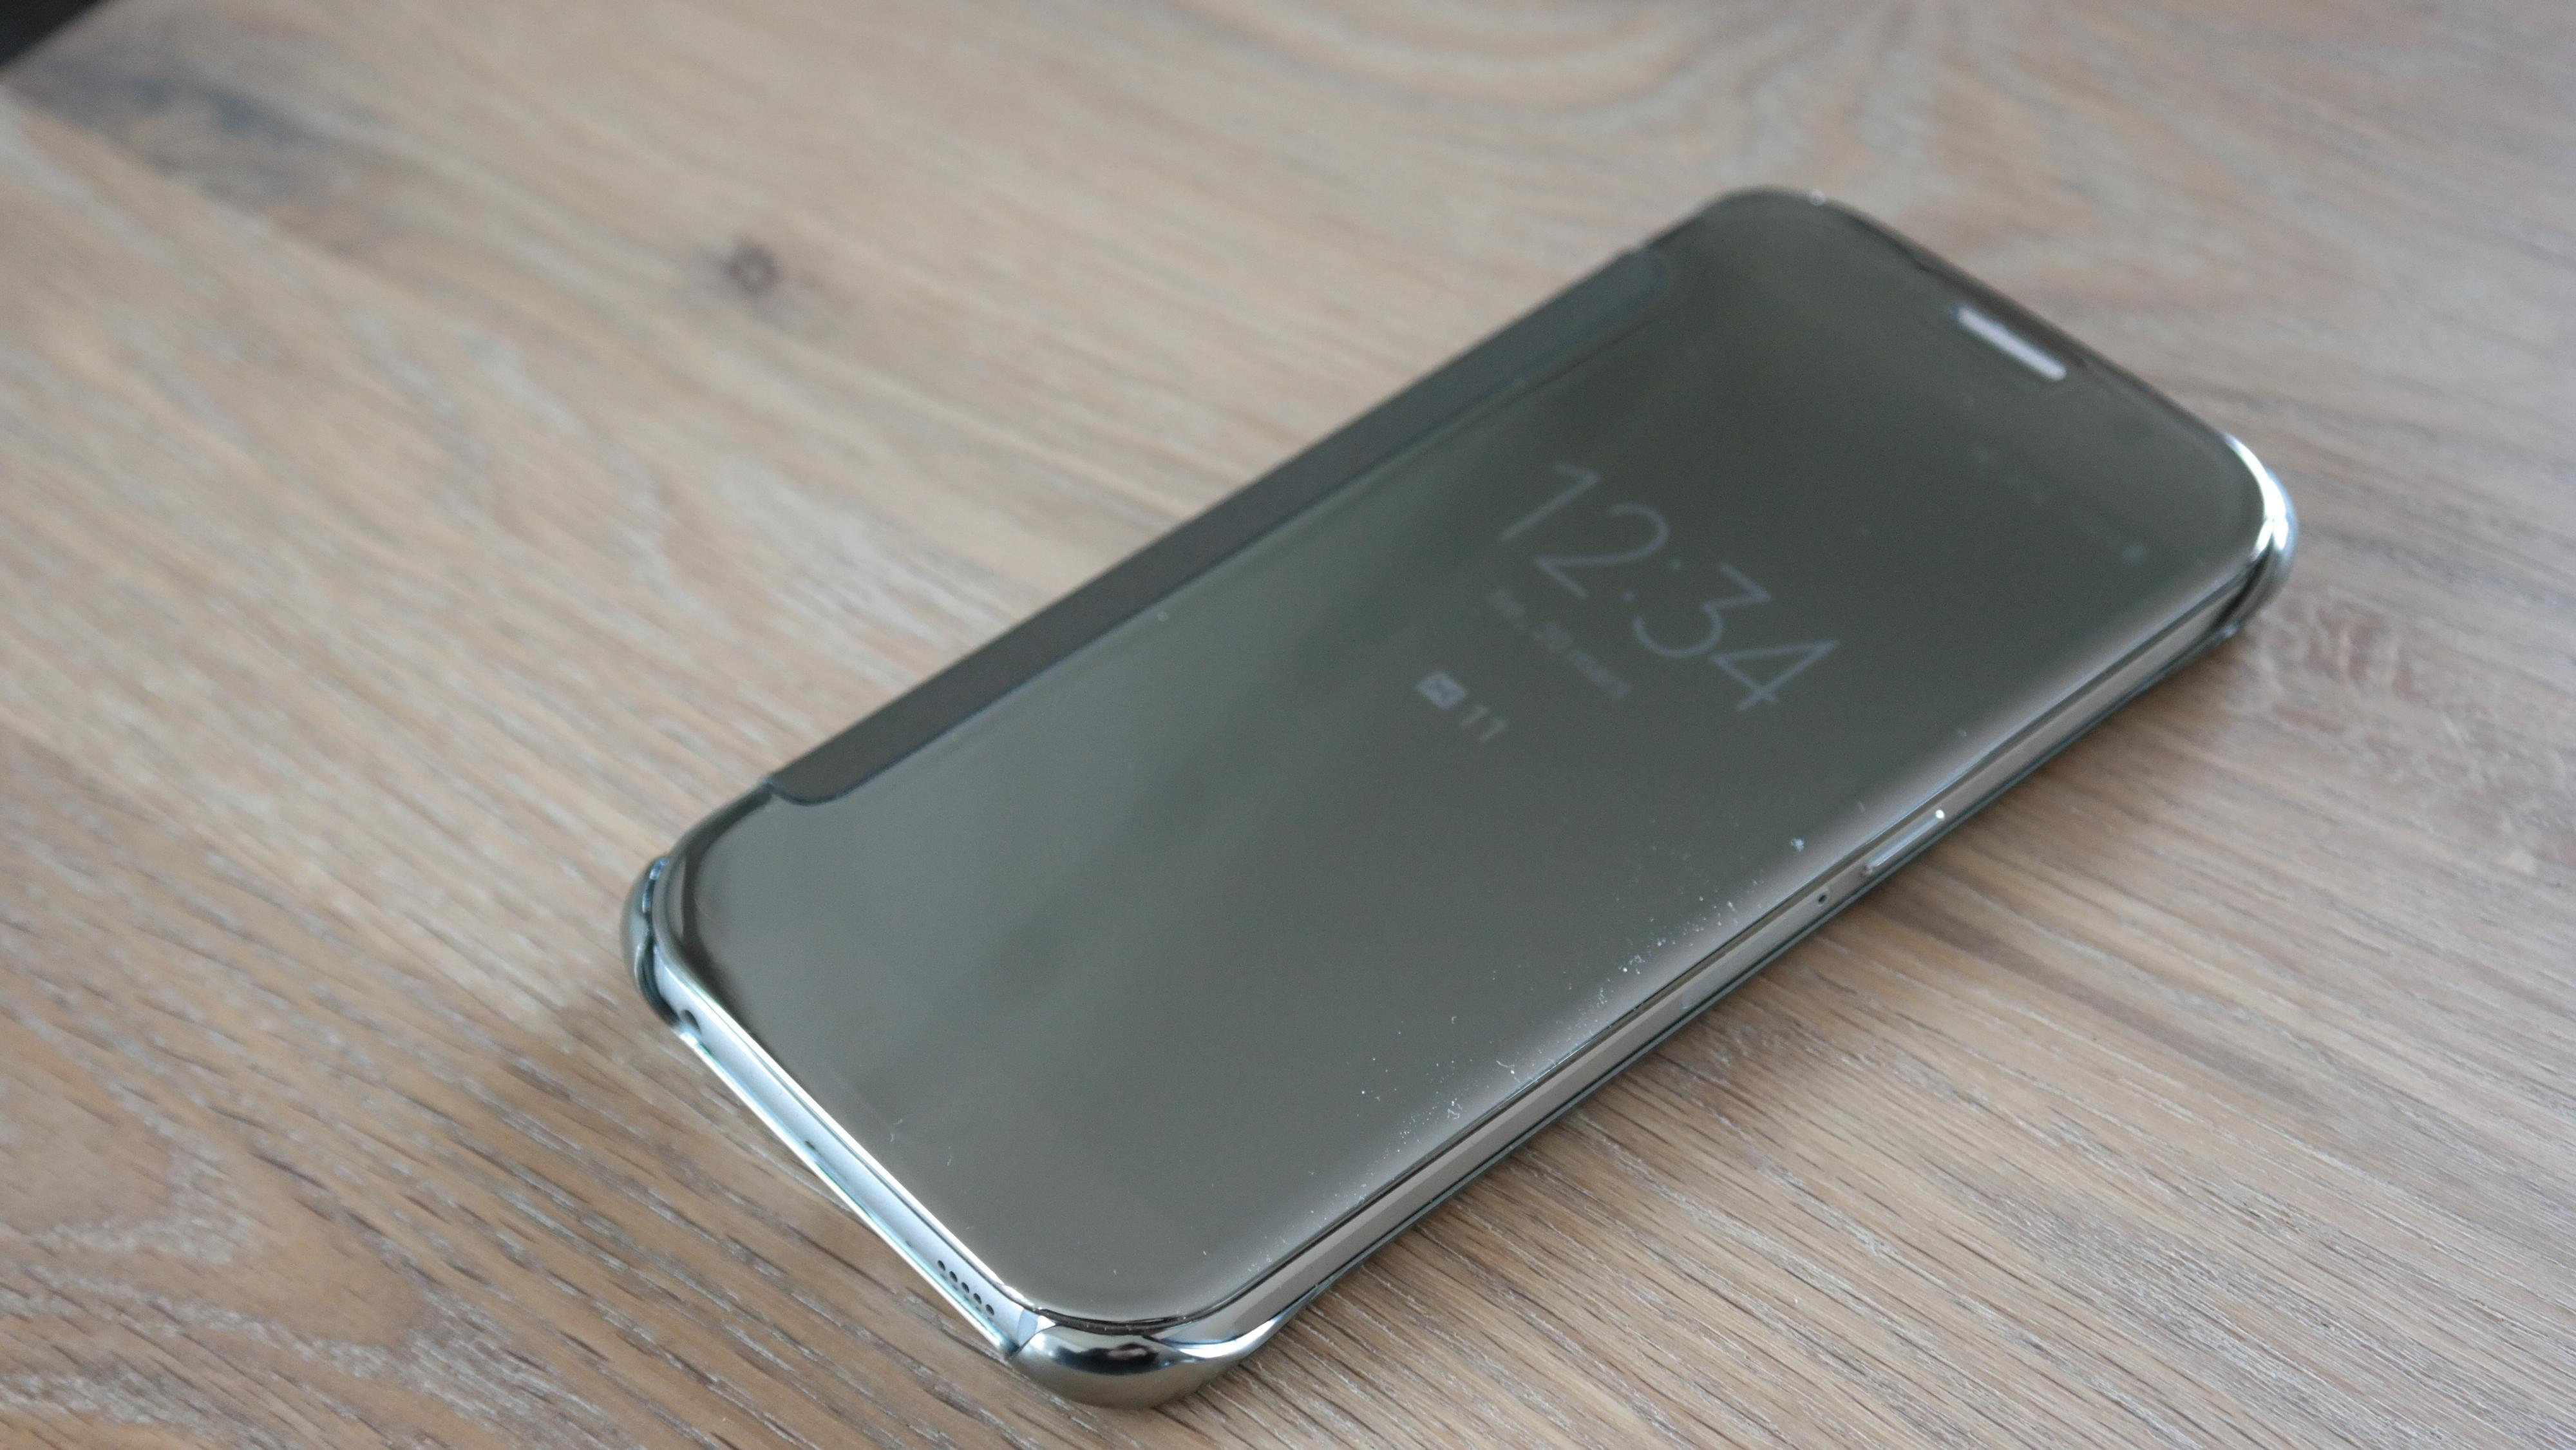 Samsungs nye Clear View Cover har frontdeksel med touch og transparent speil. Foto: Espen Irwing Swang, Tek.no